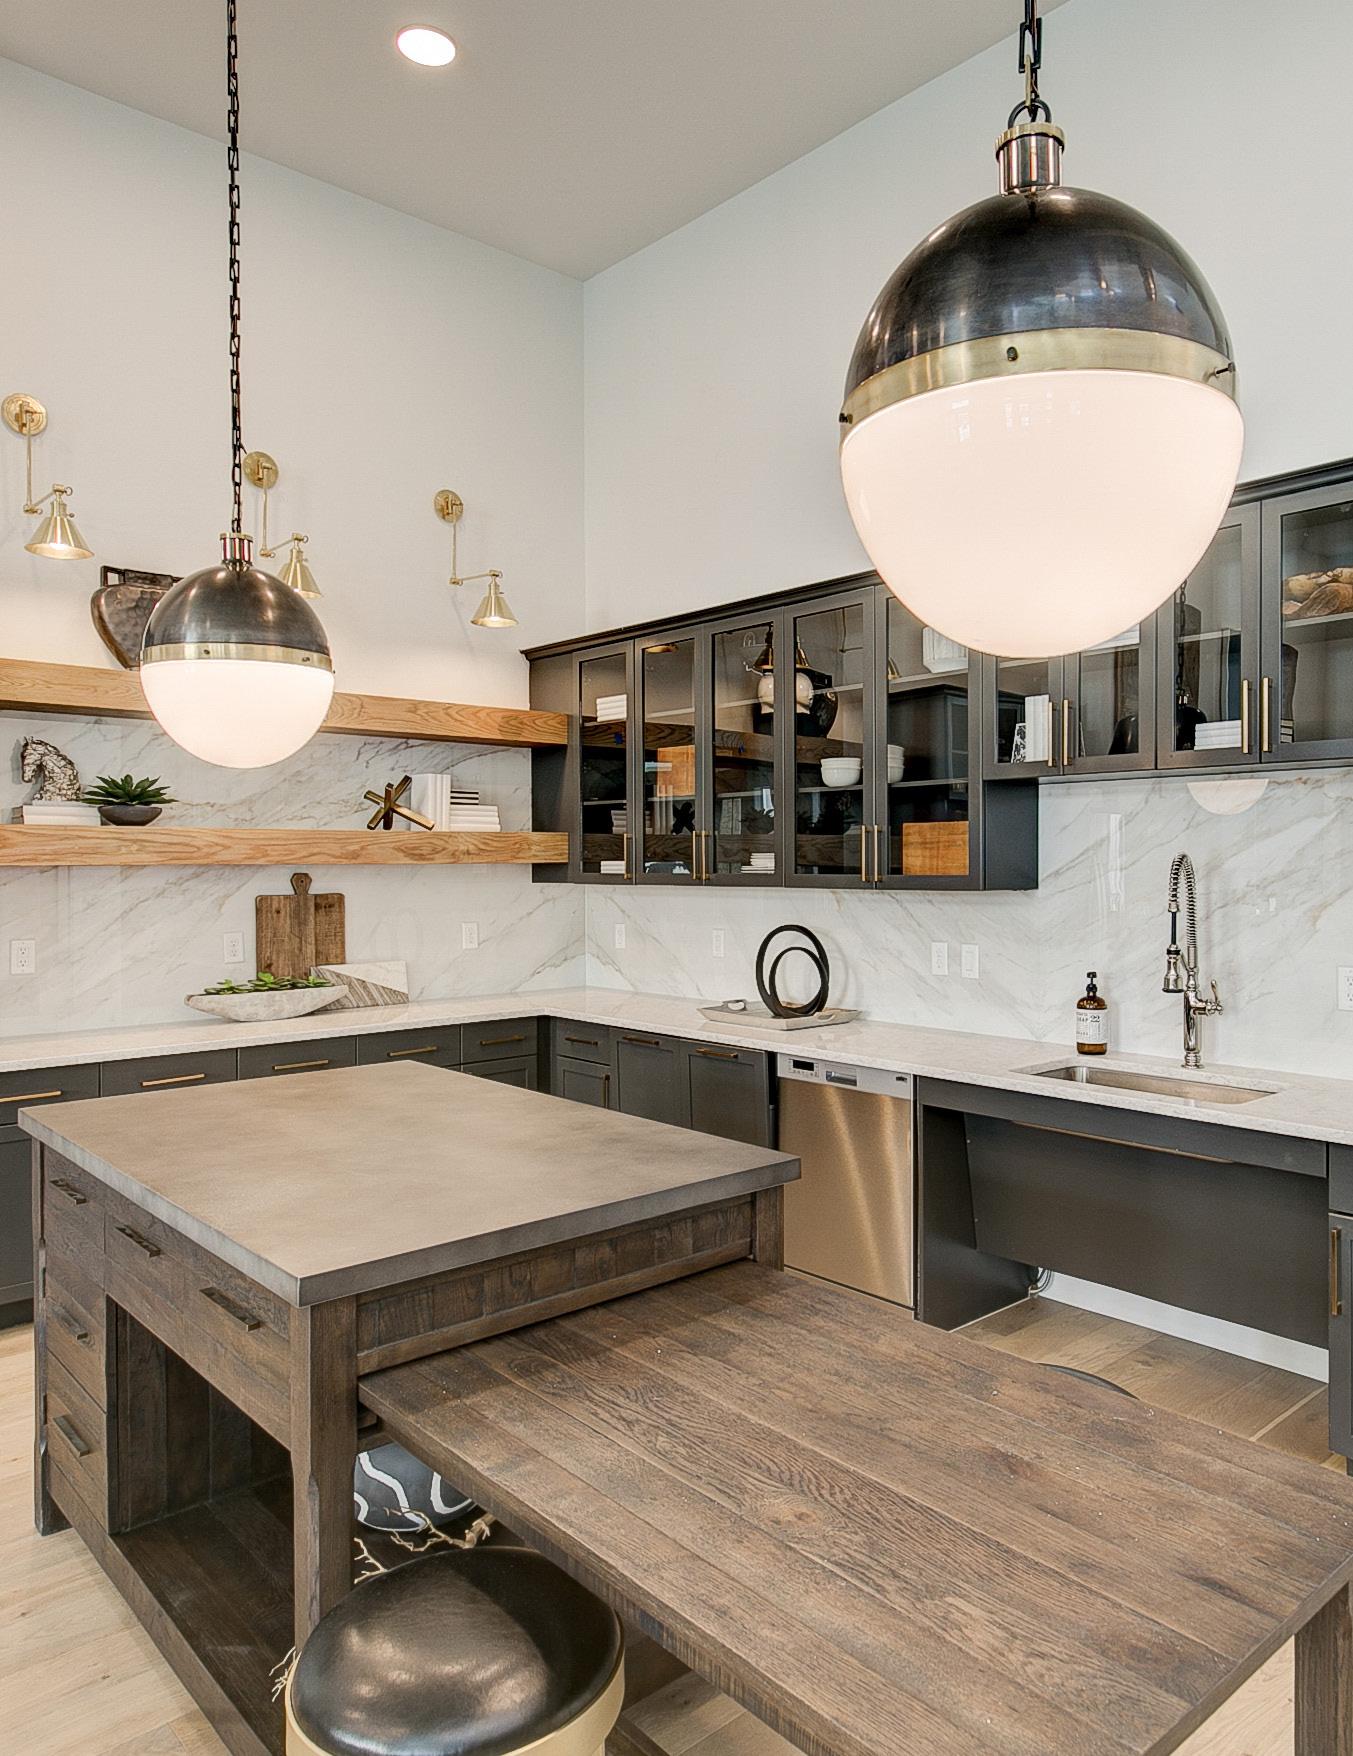 Kitchen Design by Shannon Gidney, IBB Designer